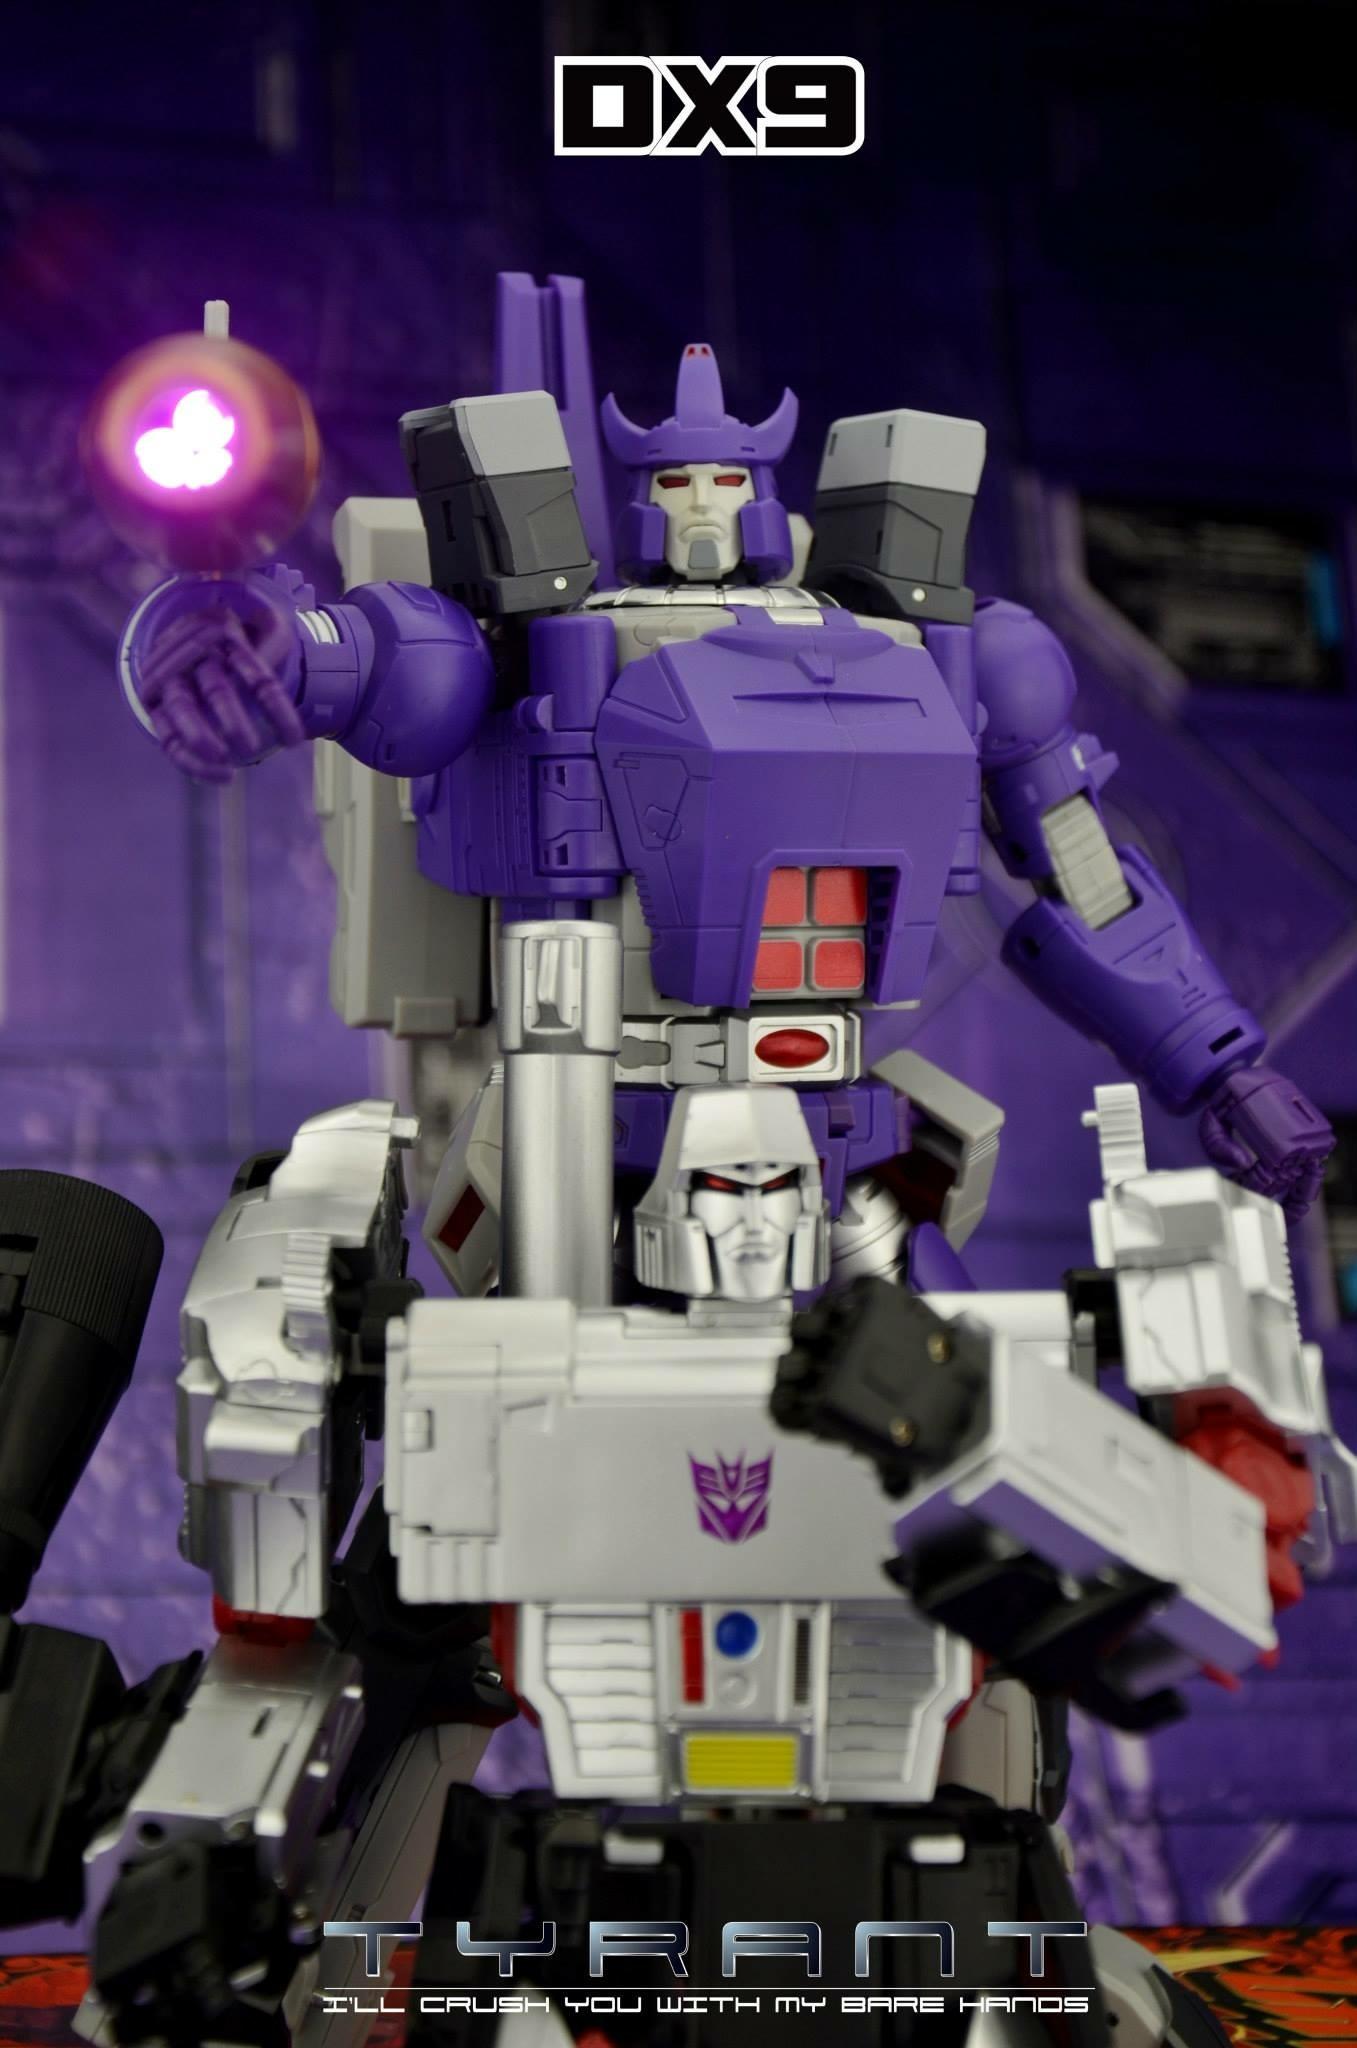 [DX9 Toys] Produit Tiers - D07 Tyrant - aka Galvatron Image23